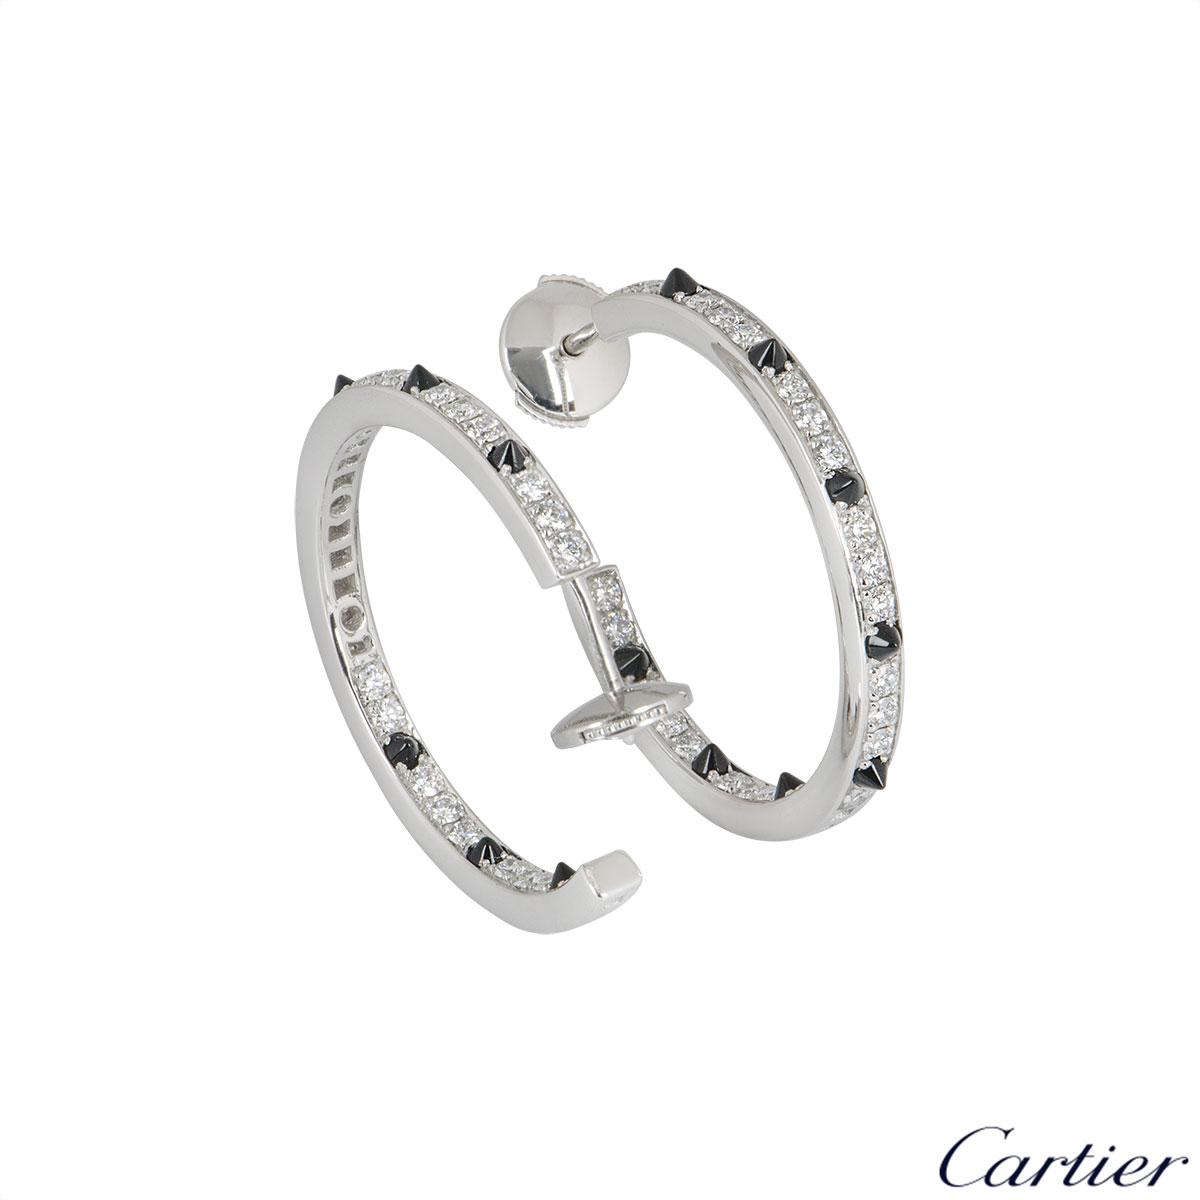 Cartier White Gold Panthere De Cartier Earrings